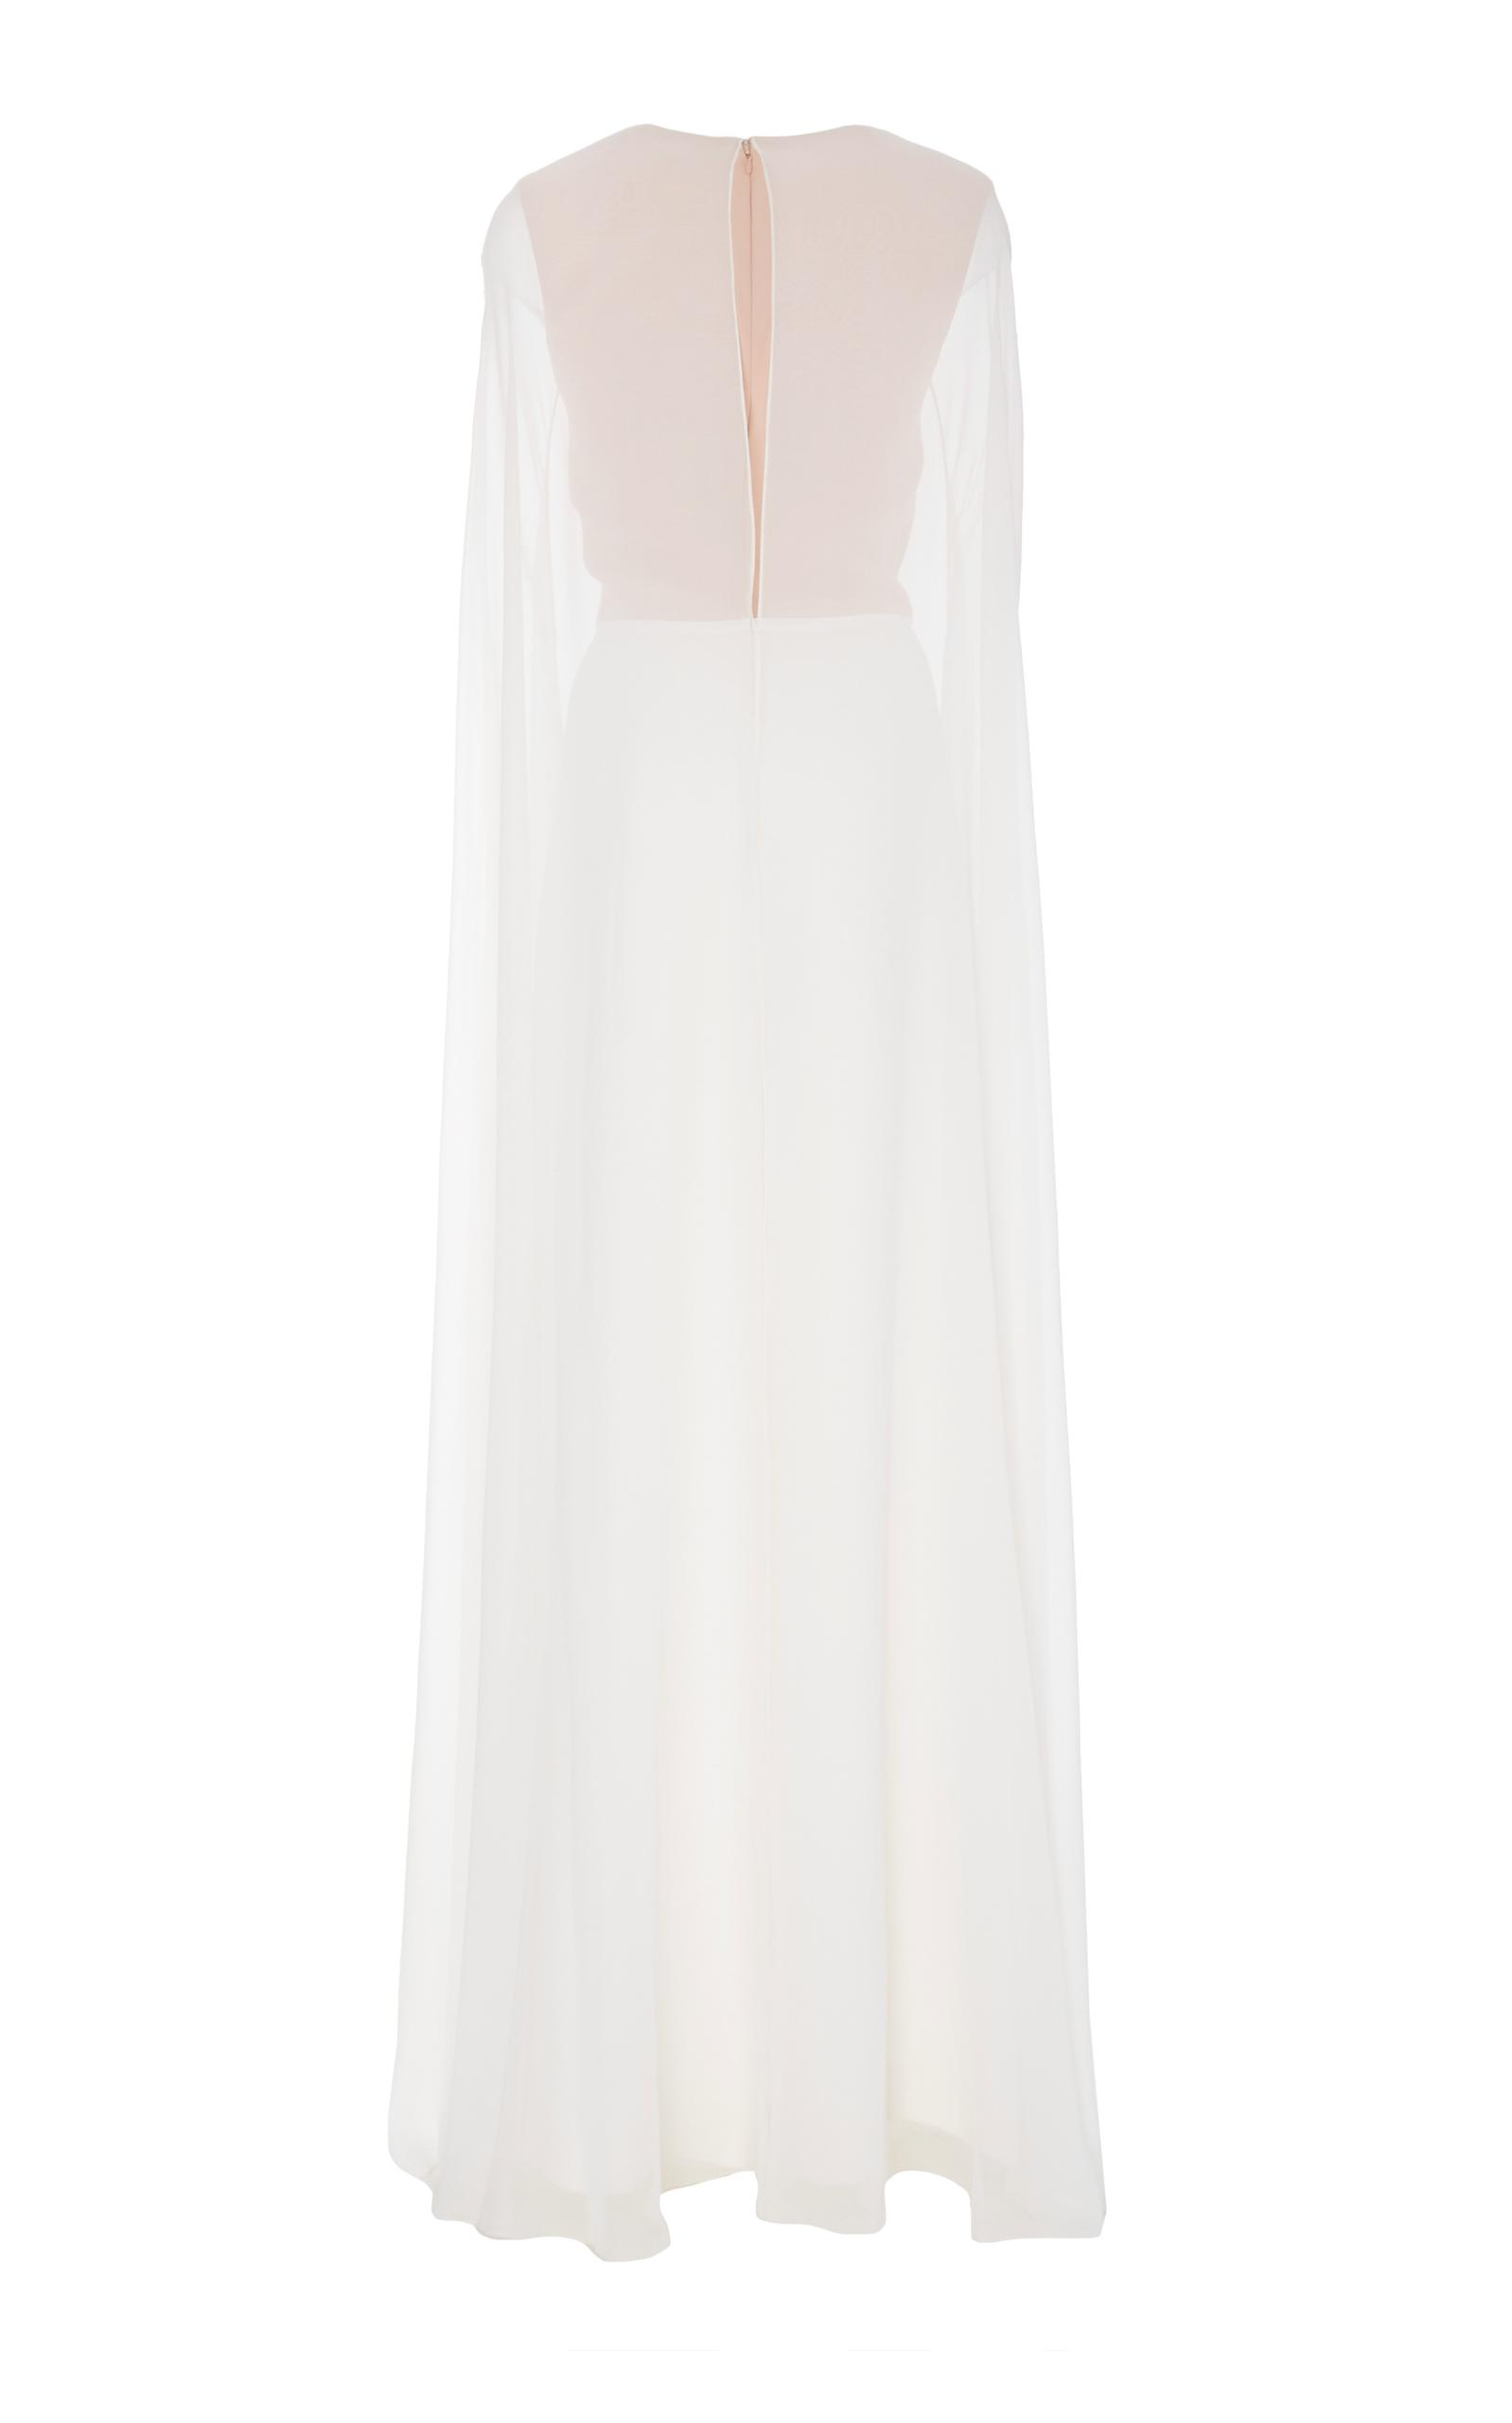 9234a6346e3 Lyst - Reem Acra Button Down Caftan Jumpsuit in White